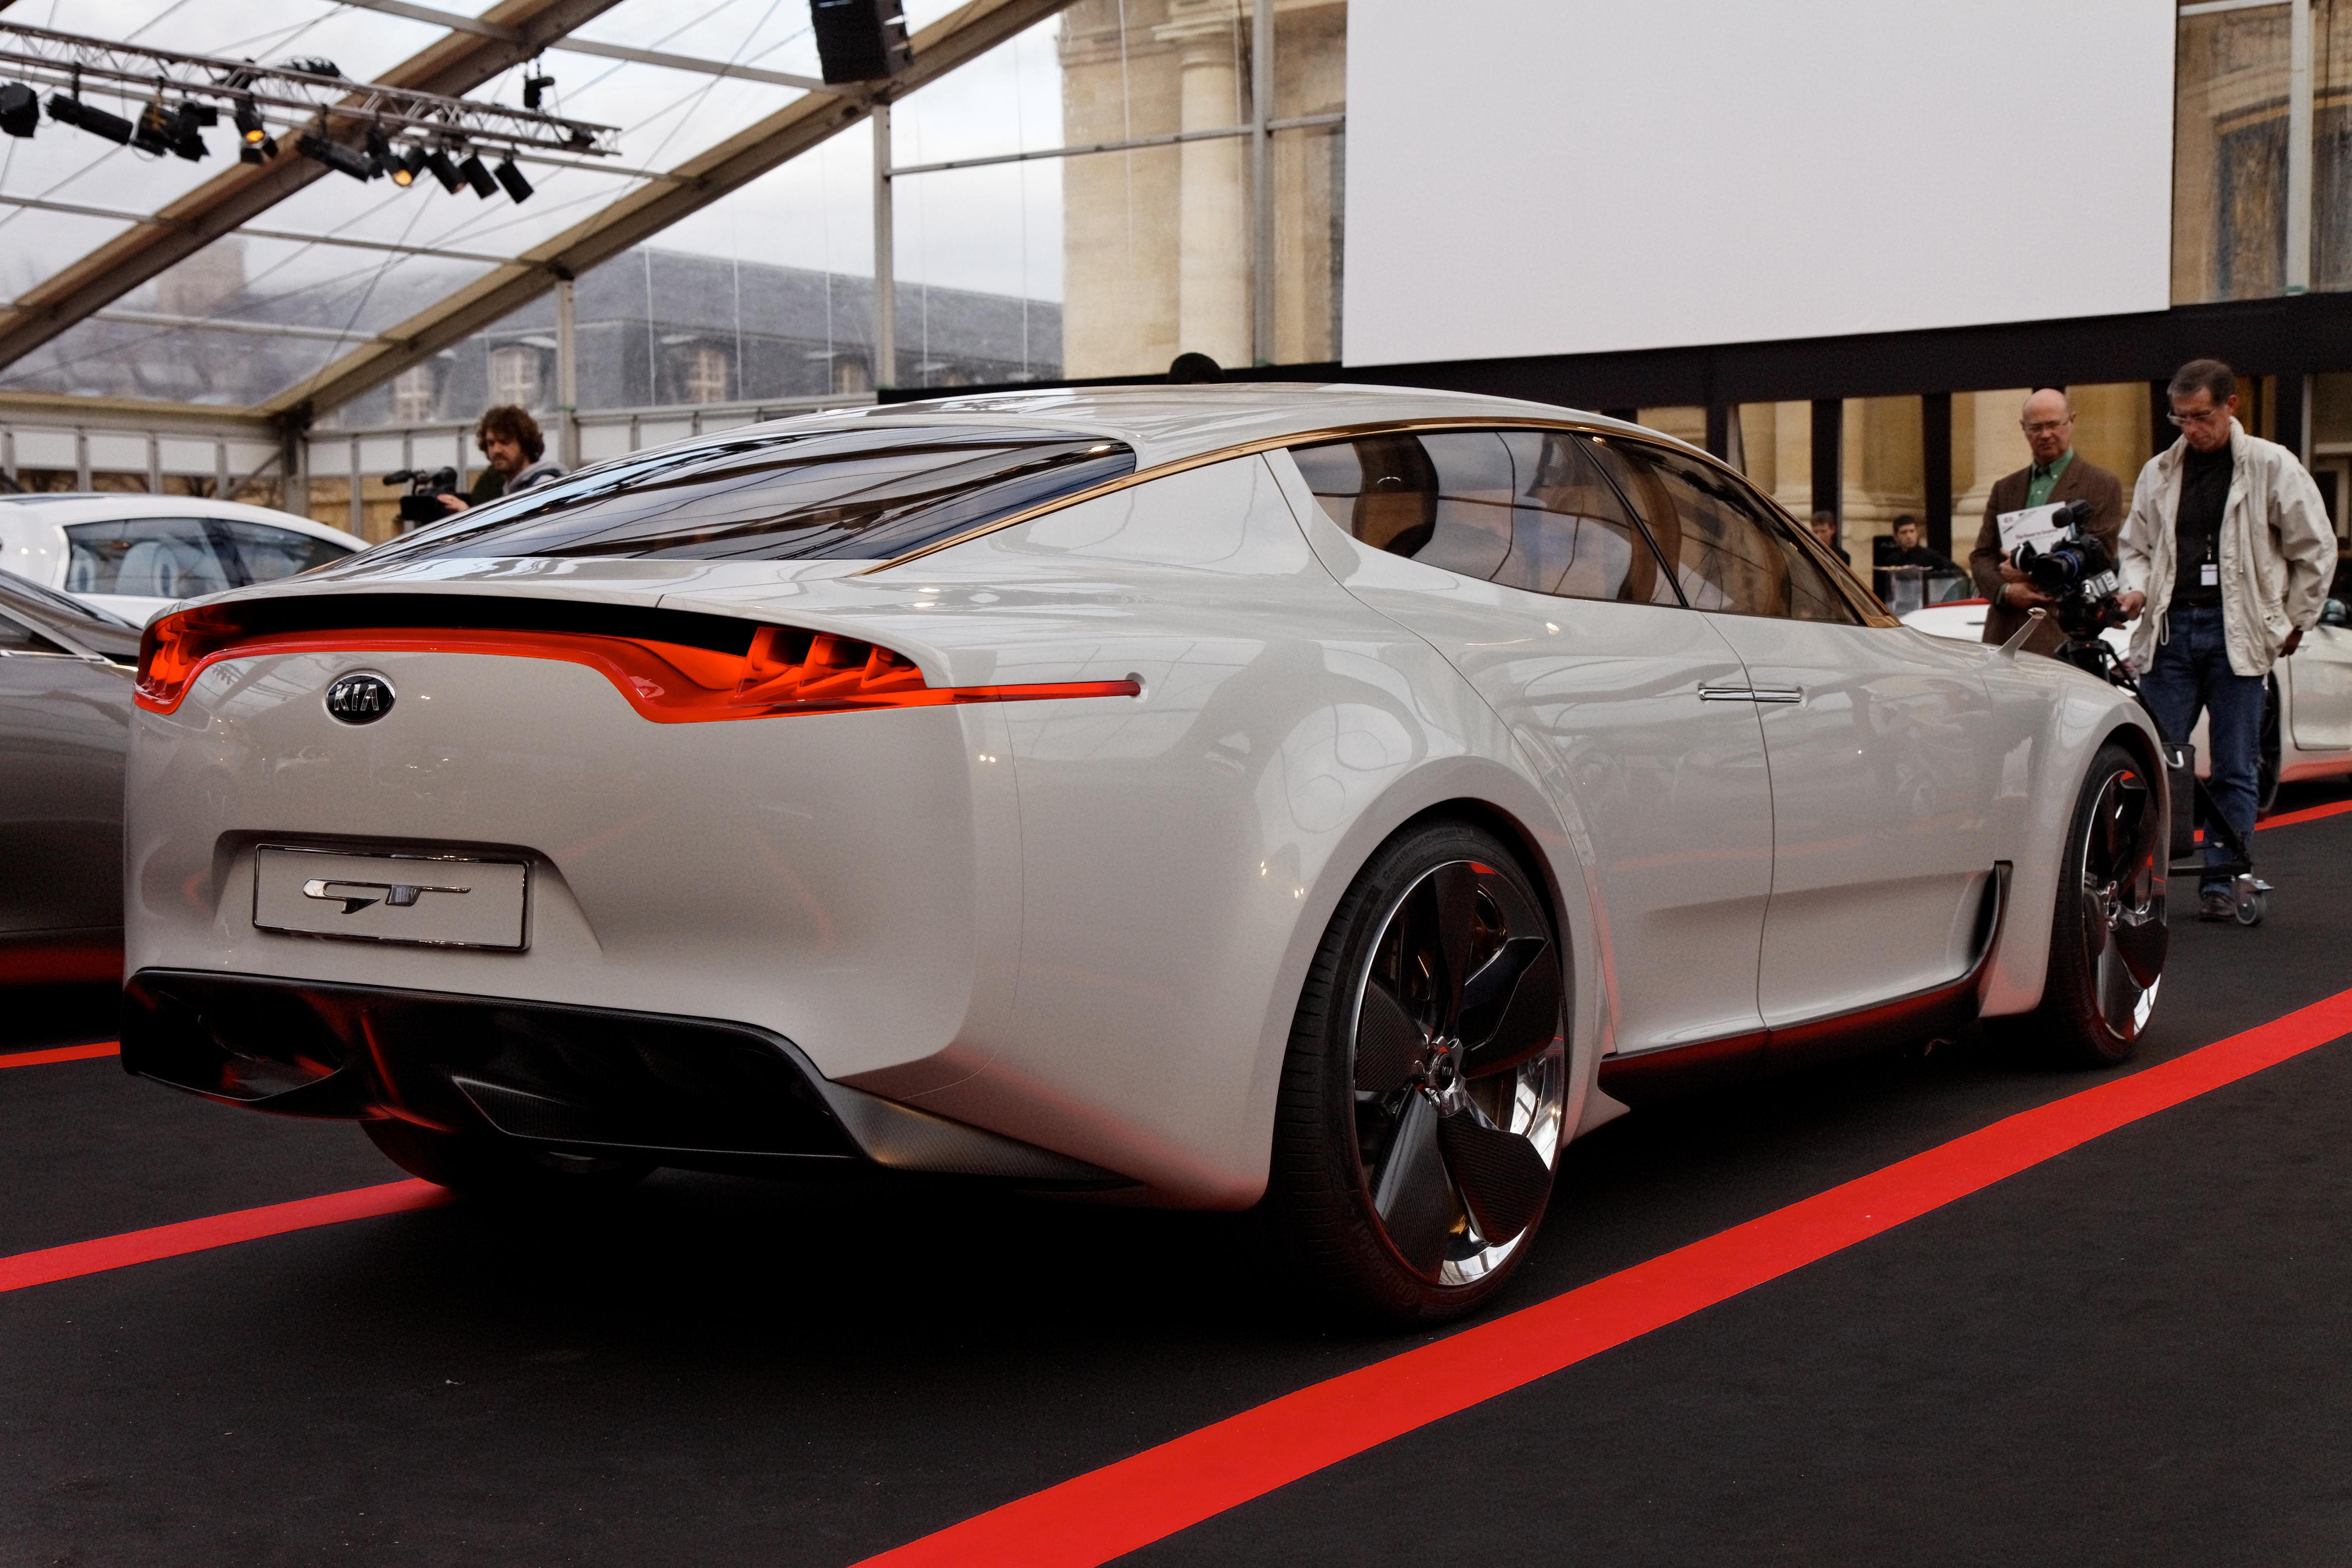 2017 Kia Optima >> File:Festival automobile international 2012 - Kia GT - 007 ...